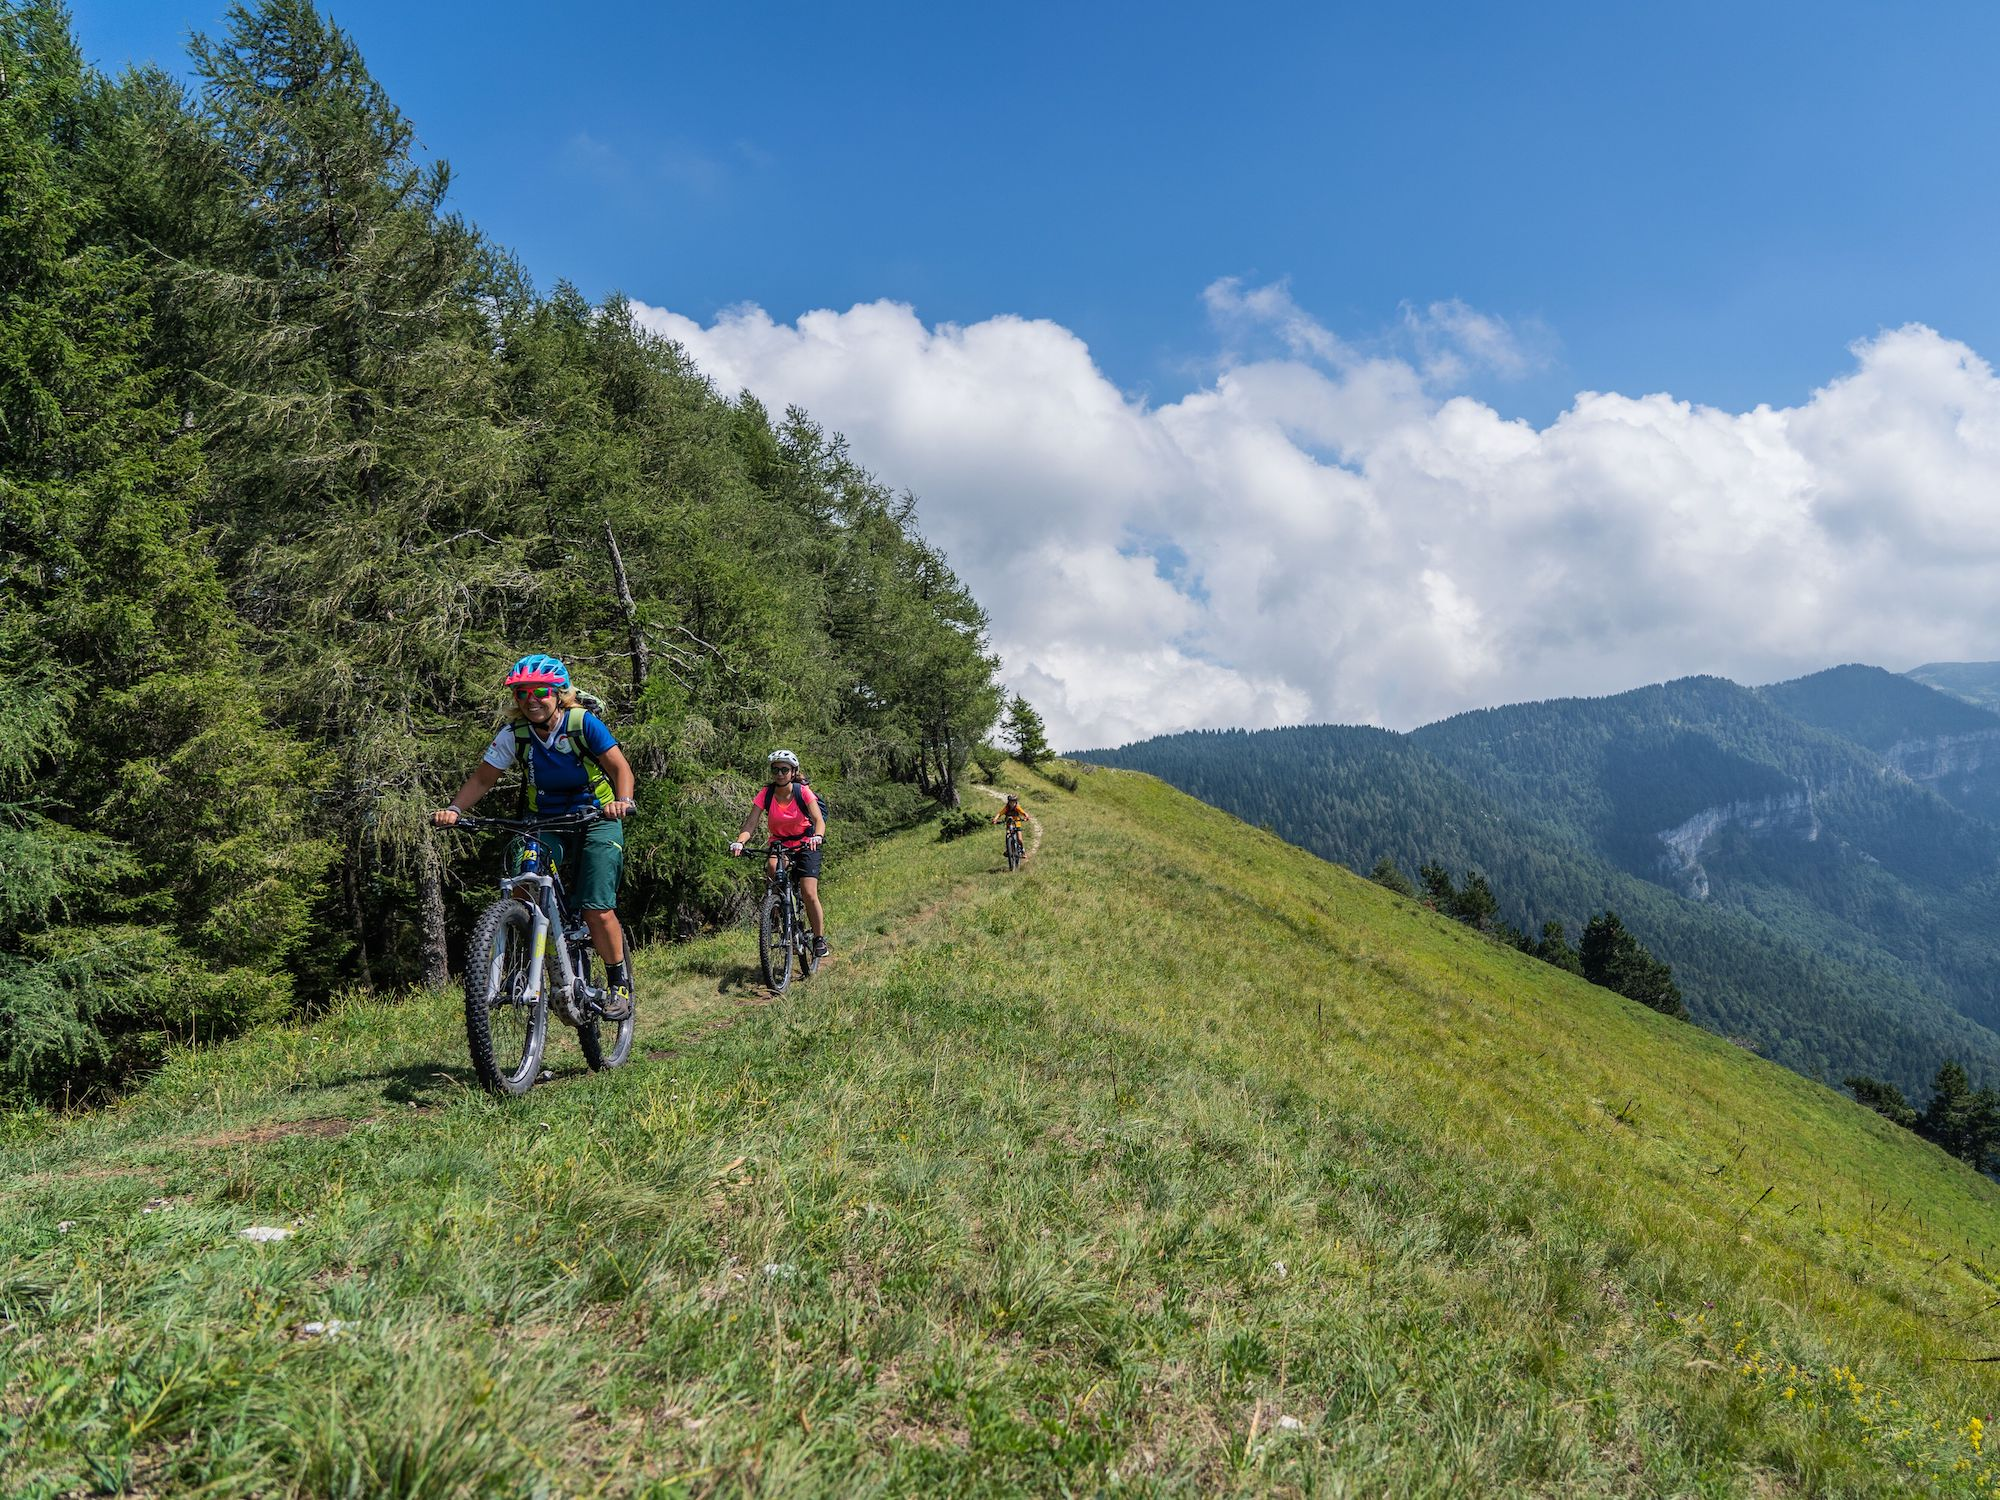 In bici sull'Alpe Cimbra